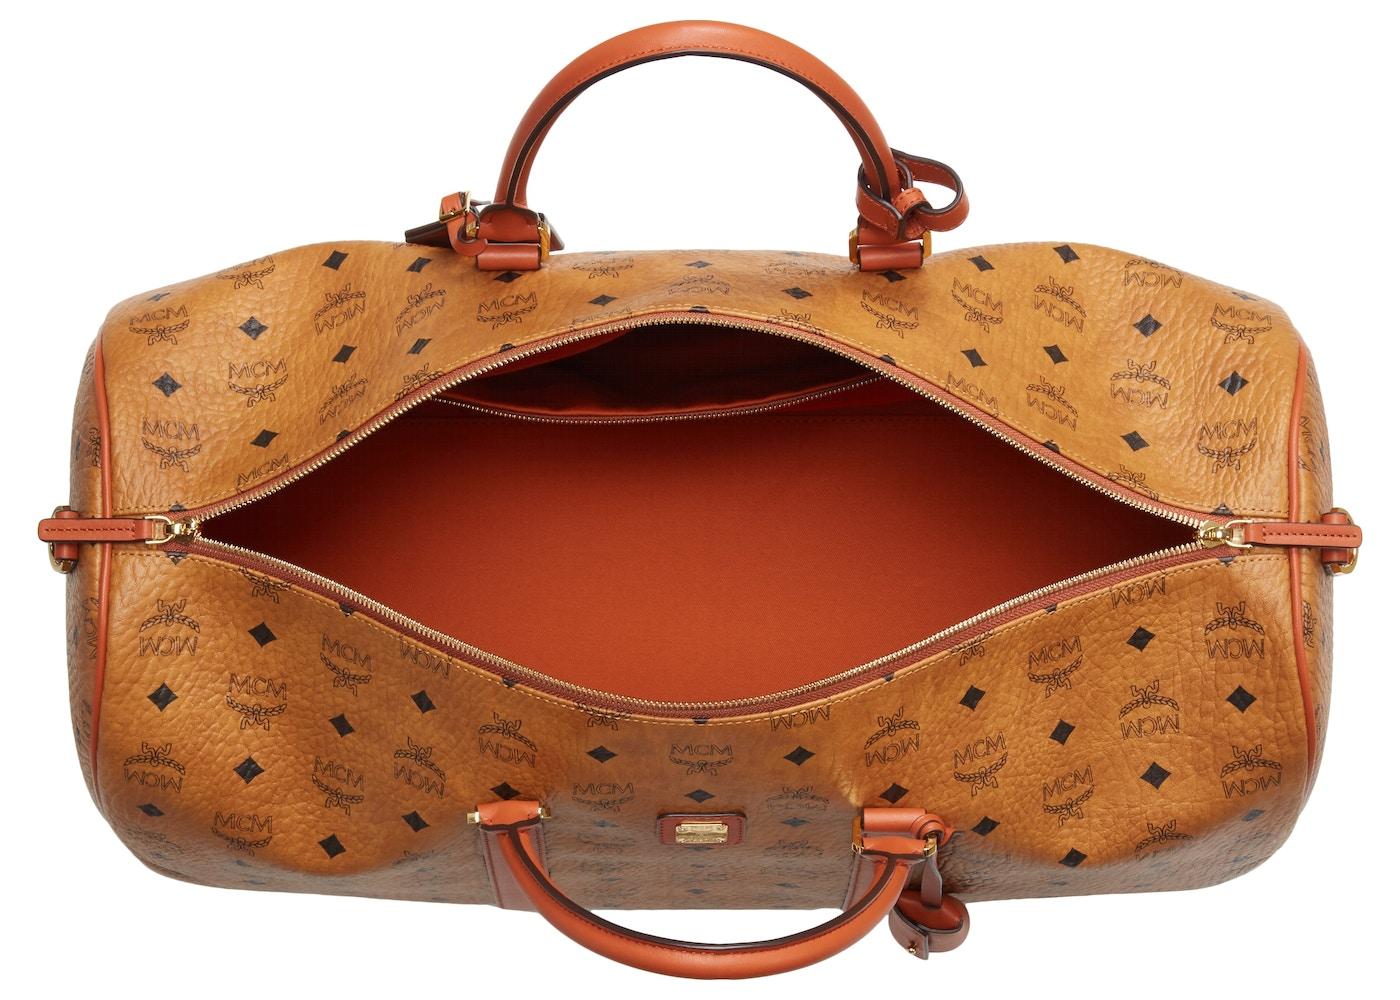 c87ad8e321f MCM Vintage Weekend Bag Visetos Nordstrom Exclusive Large Cognac